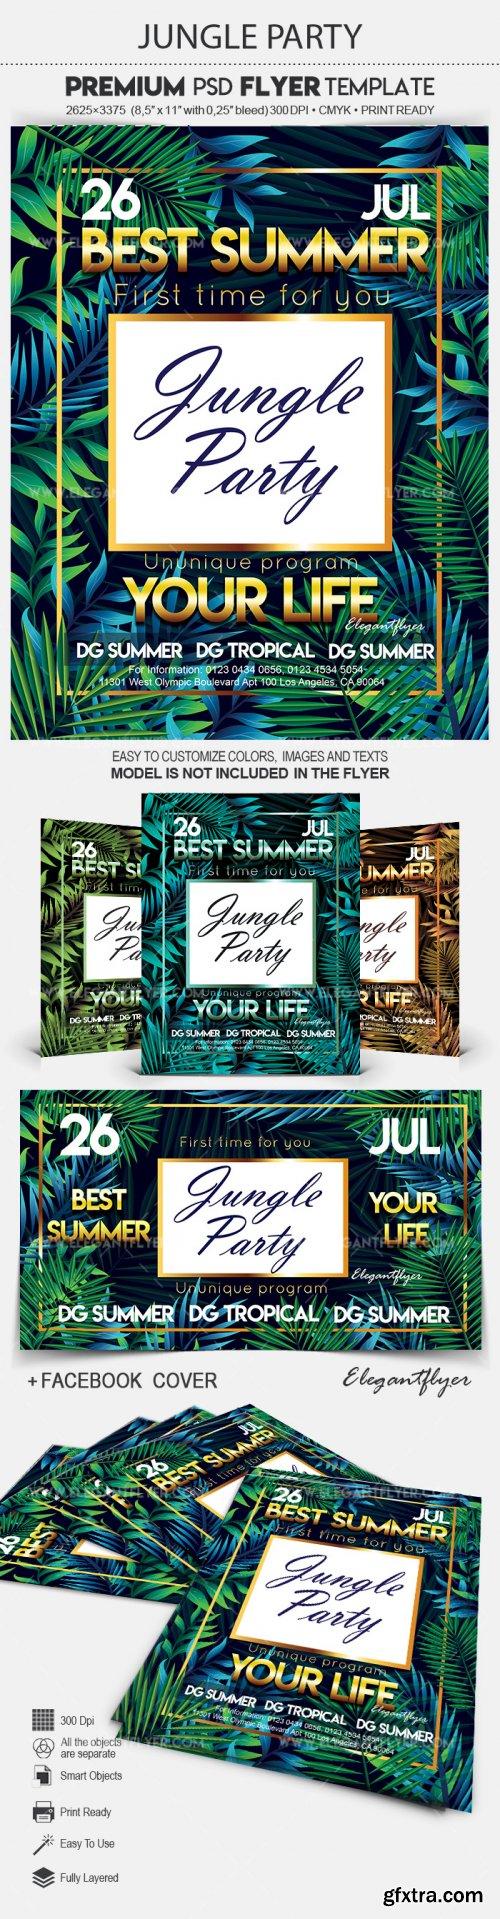 Jungle Party V7 2018 Flyer PSD Template